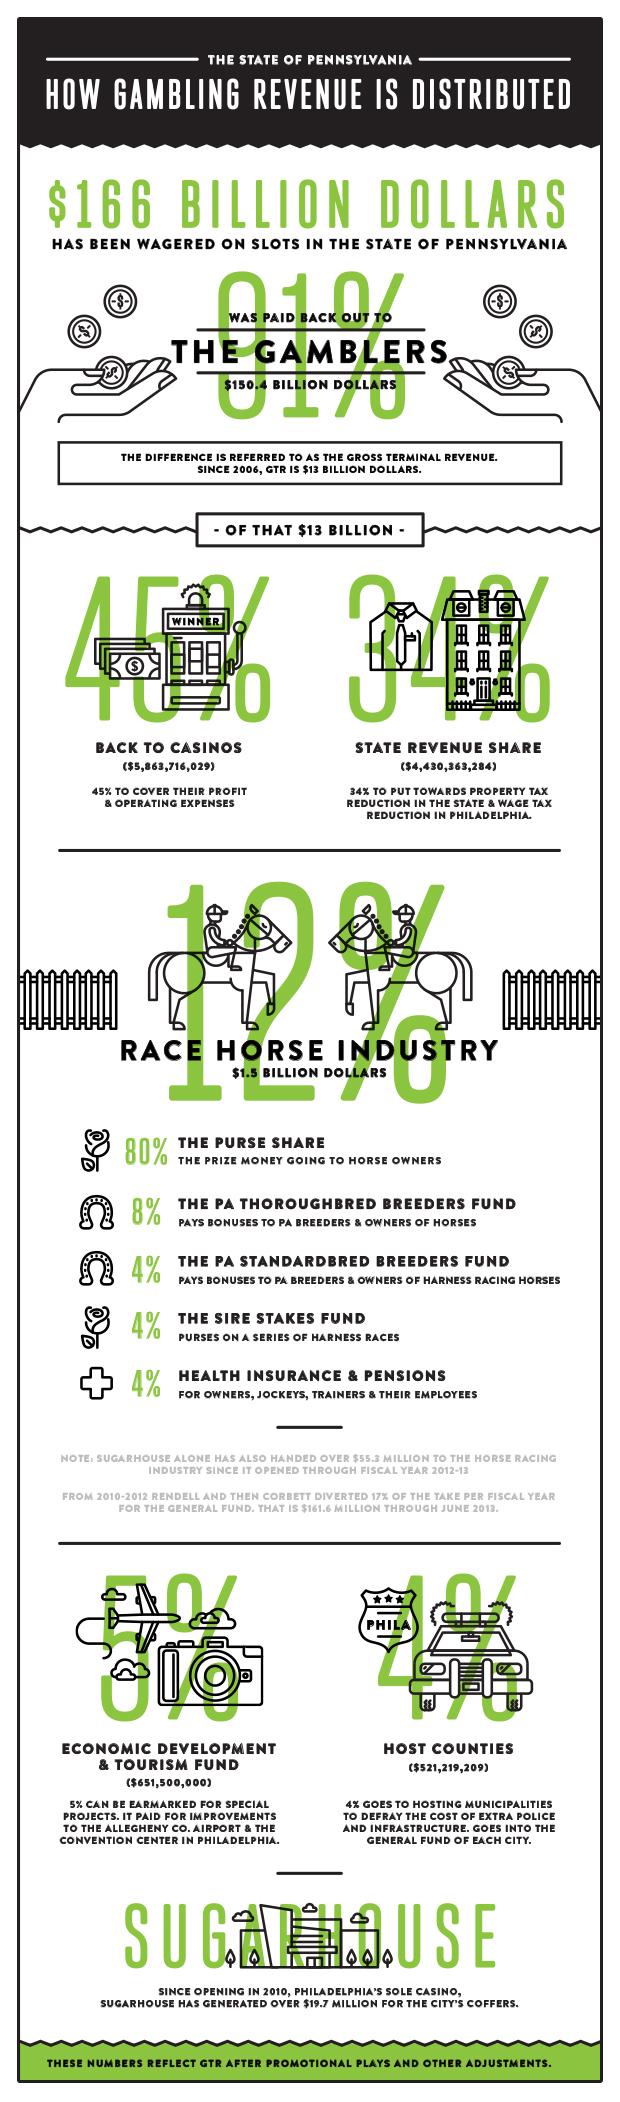 PhillyDotCom-Infographic-Gambling-0729.jpg